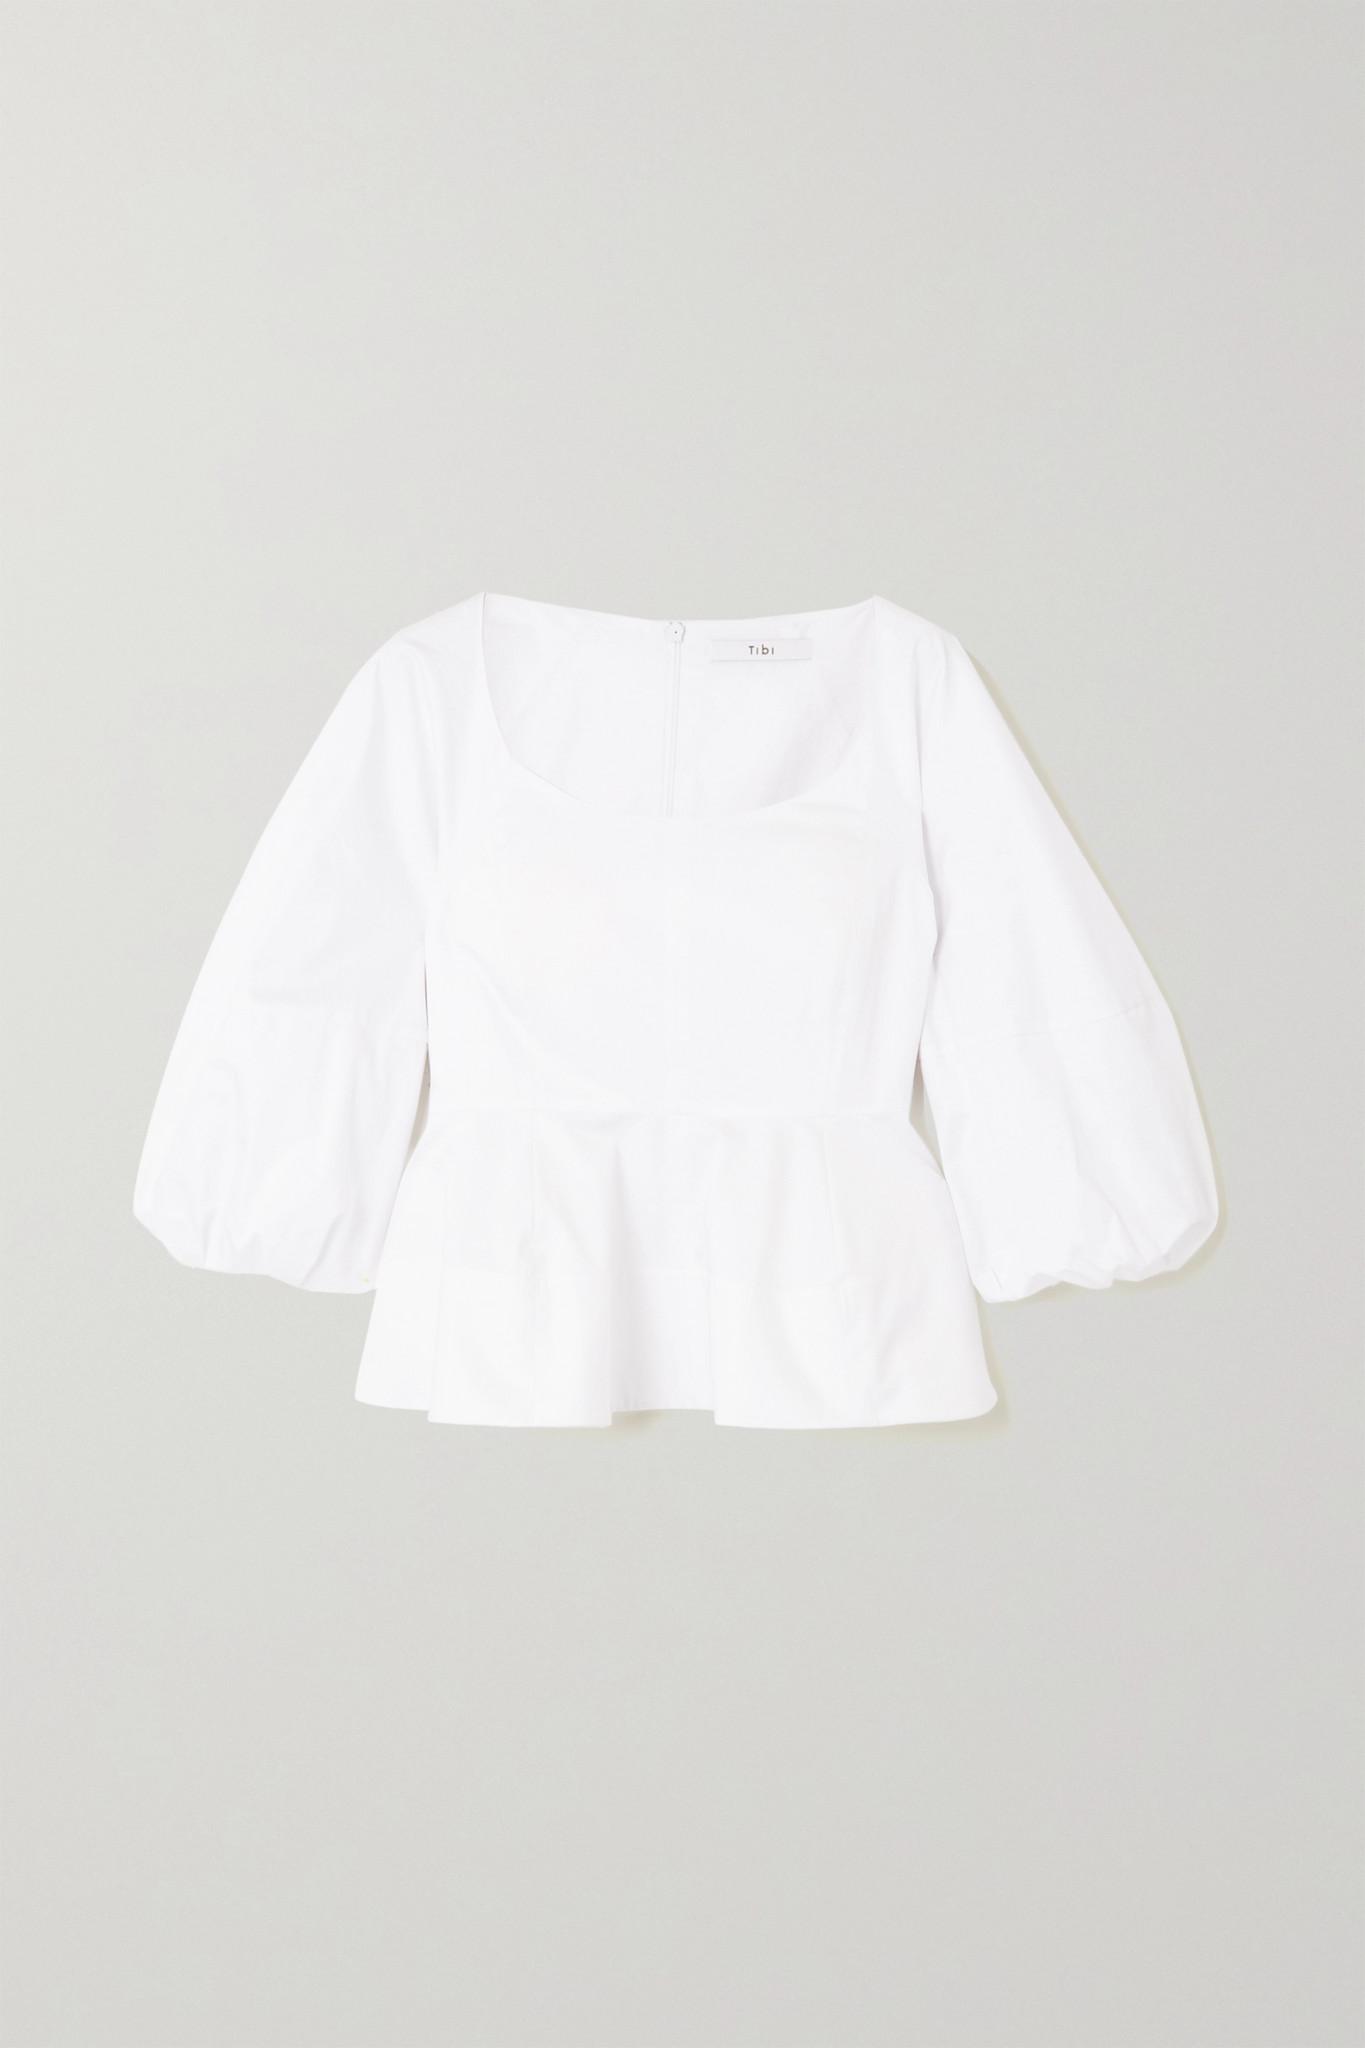 TIBI - 纯棉府绸荷叶腰摆上衣 - 白色 - US2